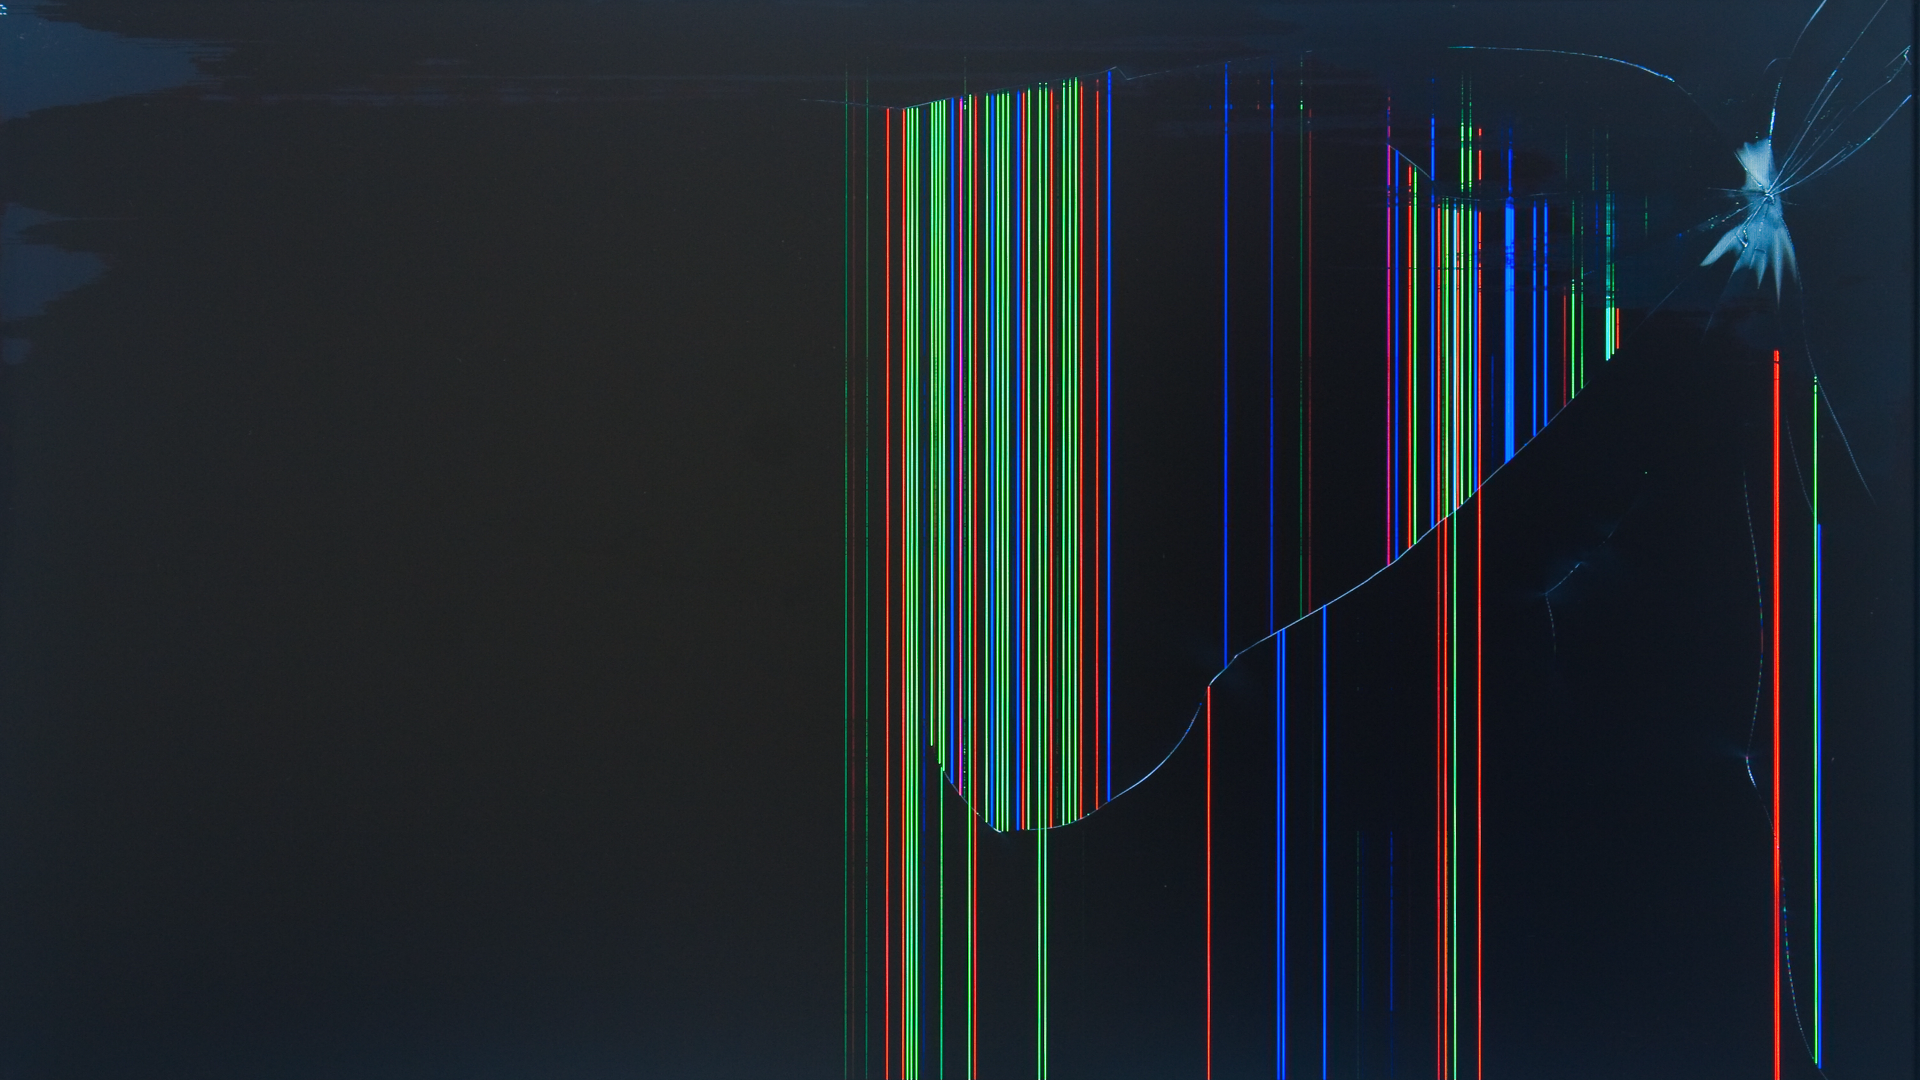 Broken Screen Wallpaper: Broken Screens Wallpapers High Quality